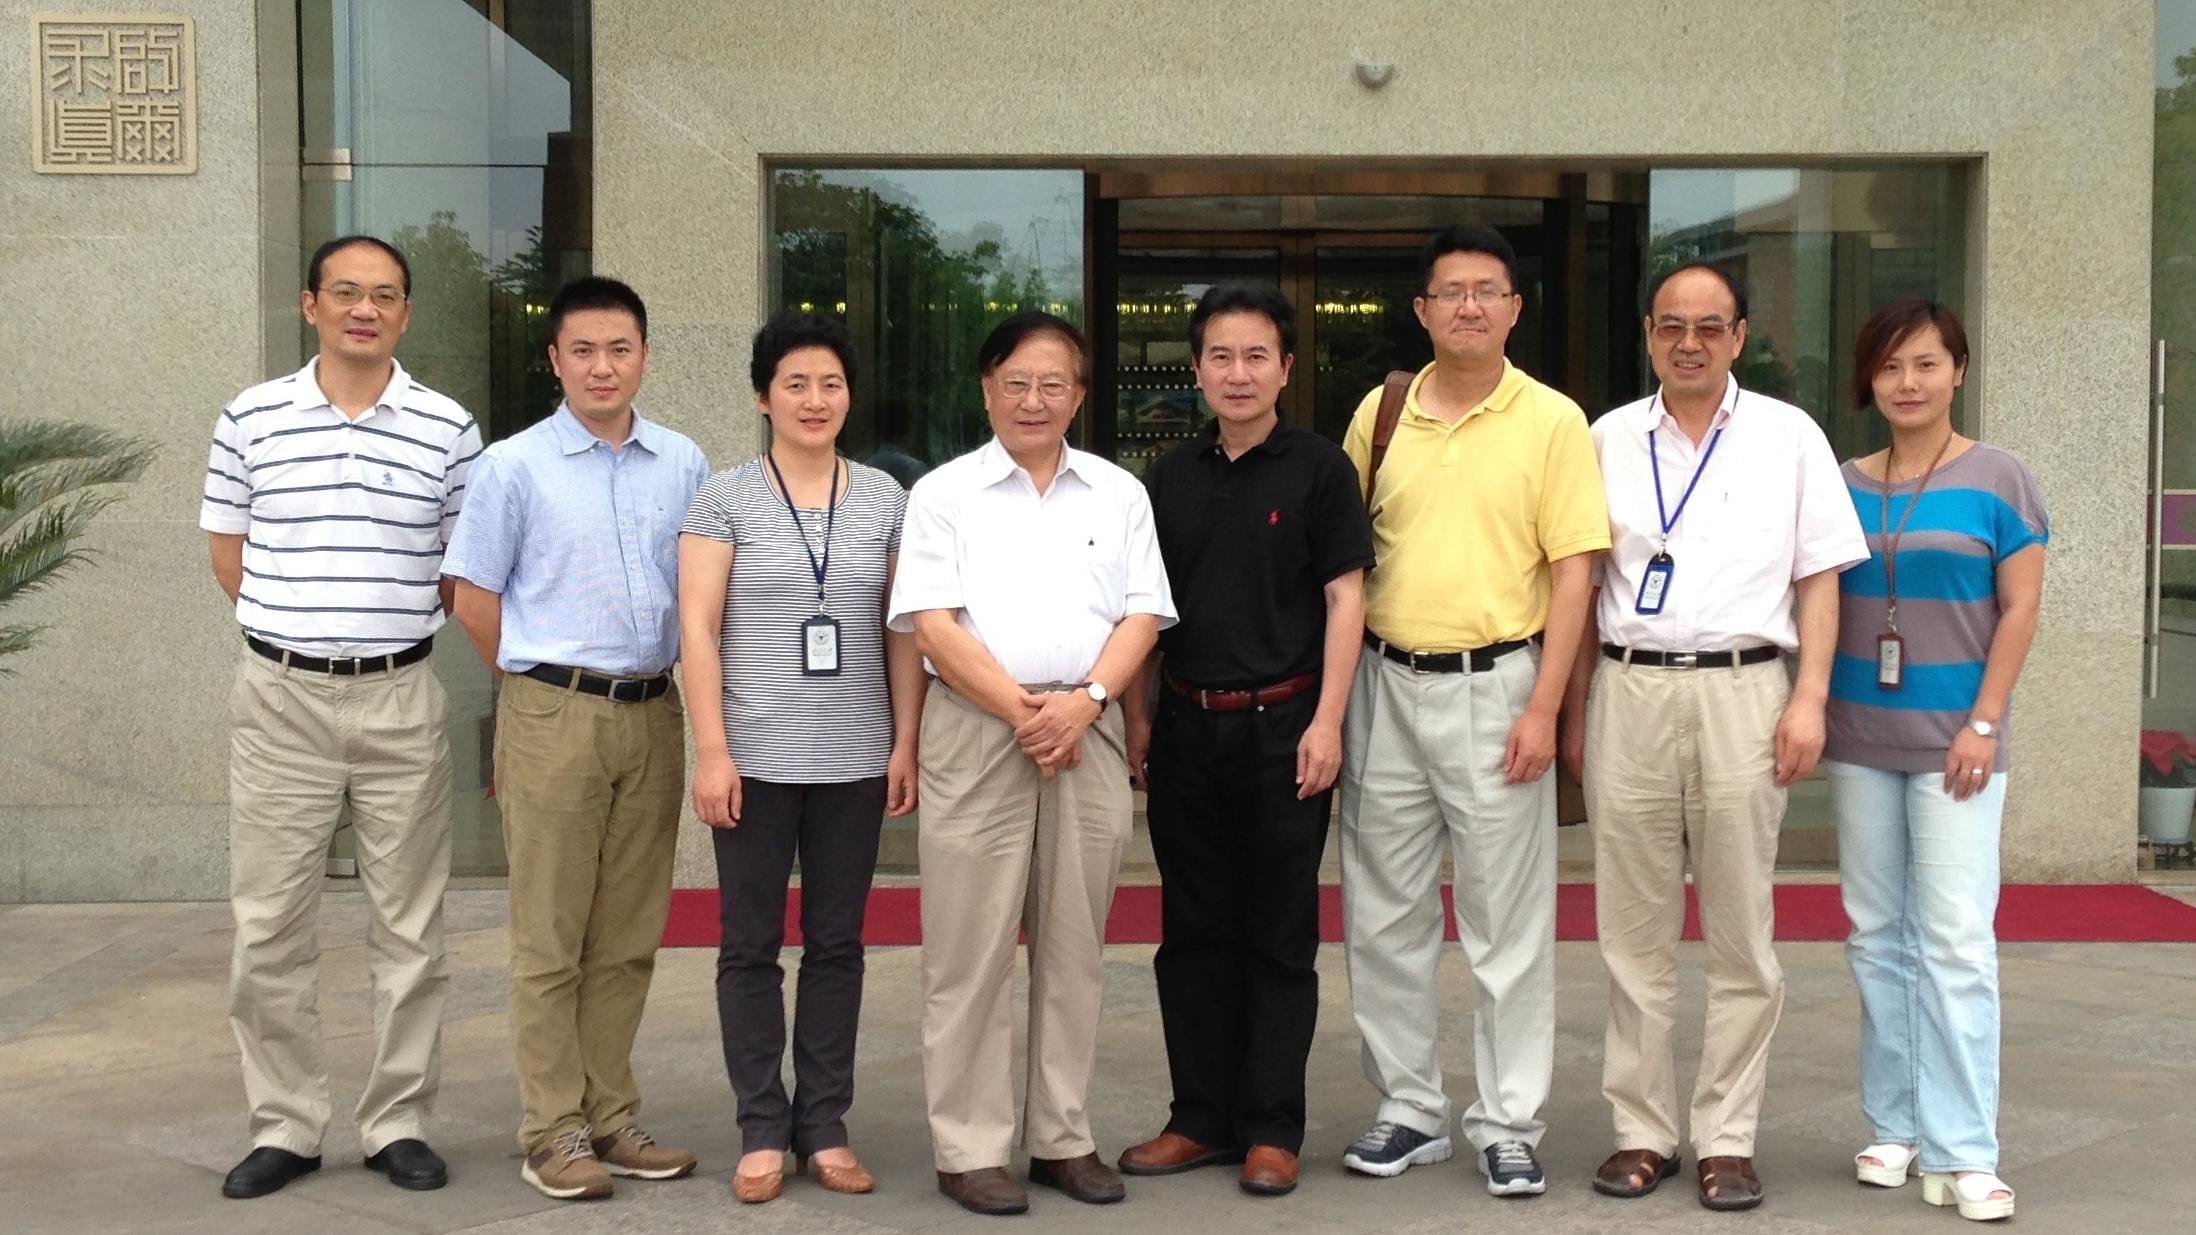 Normal   0           false   false   false     EN-US   ZH-CN   X-NONE                                                                            CHPAMSadvisor Dr. YU Hai (left four), Dr. Harry Zhang (right three) and other colleaguesat Zhejiang University